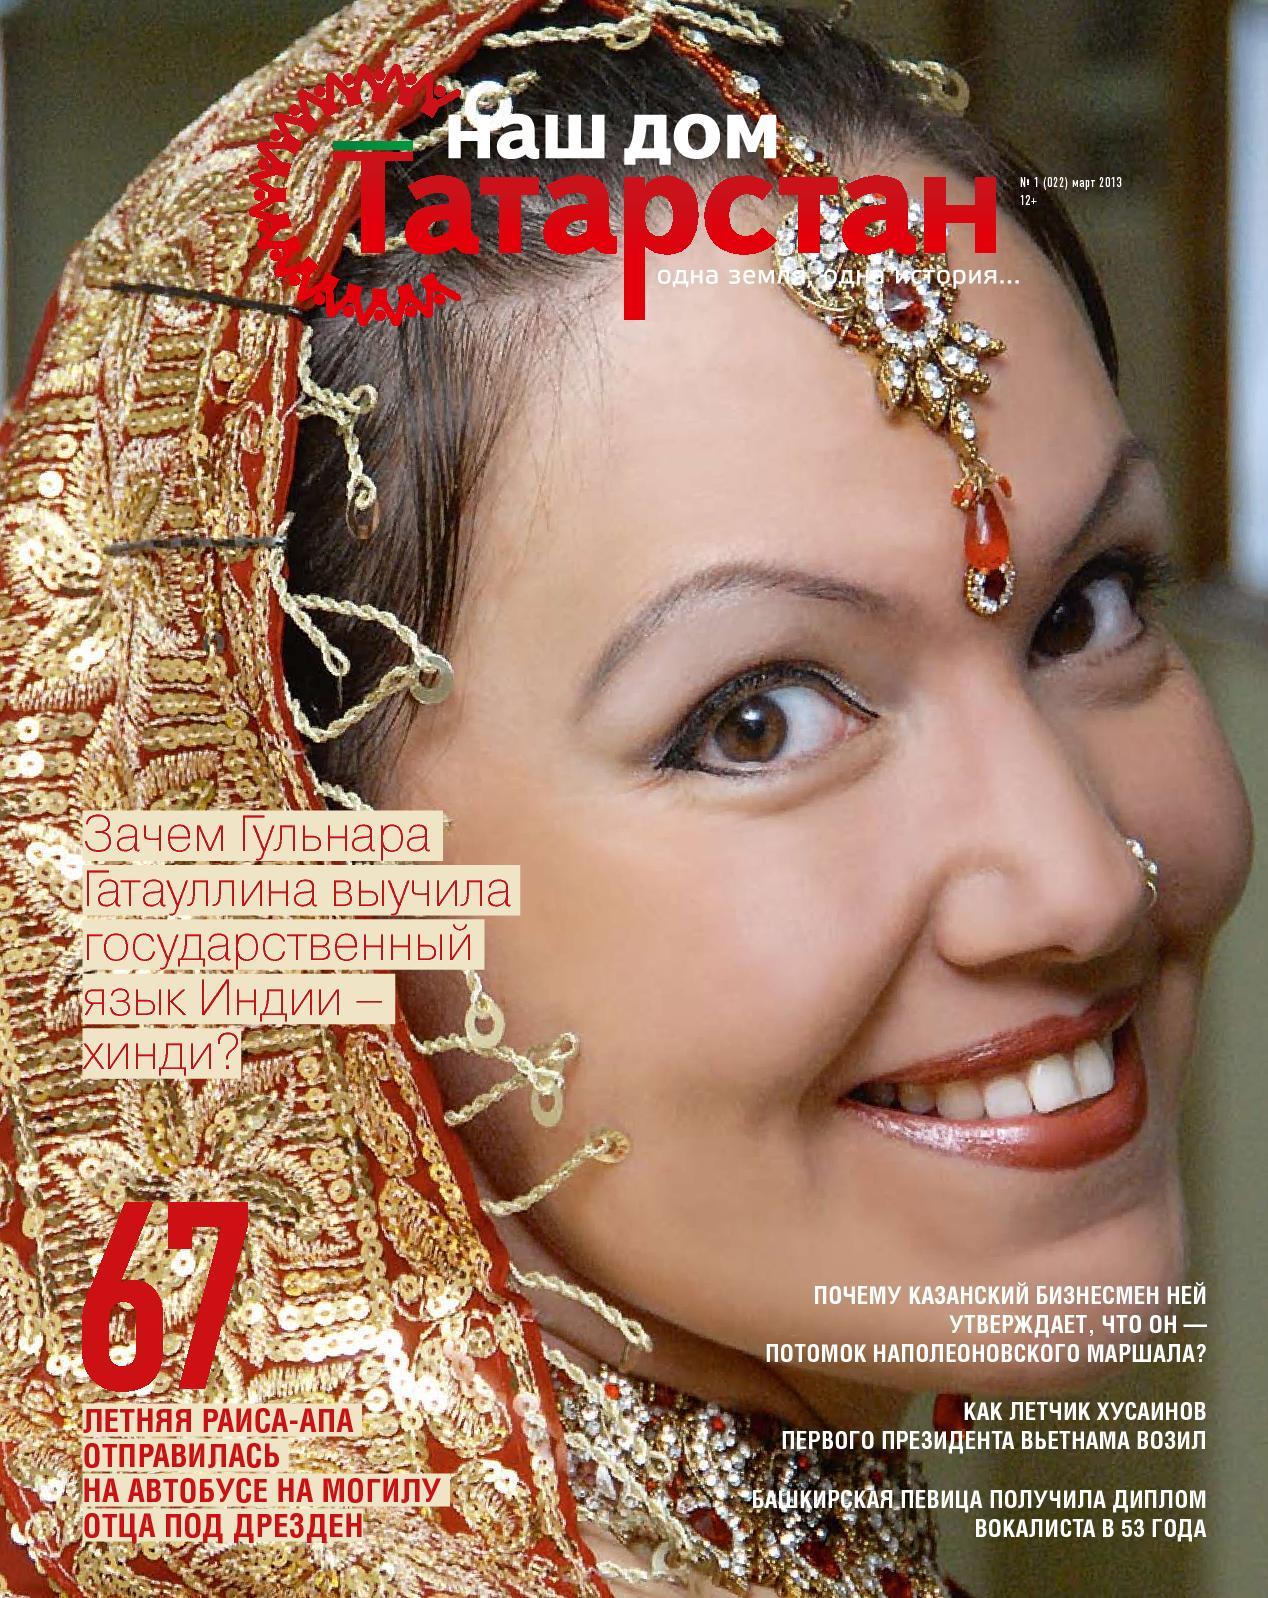 Ольга Ломоносова На Пробежке – 45 Секунд (2013)